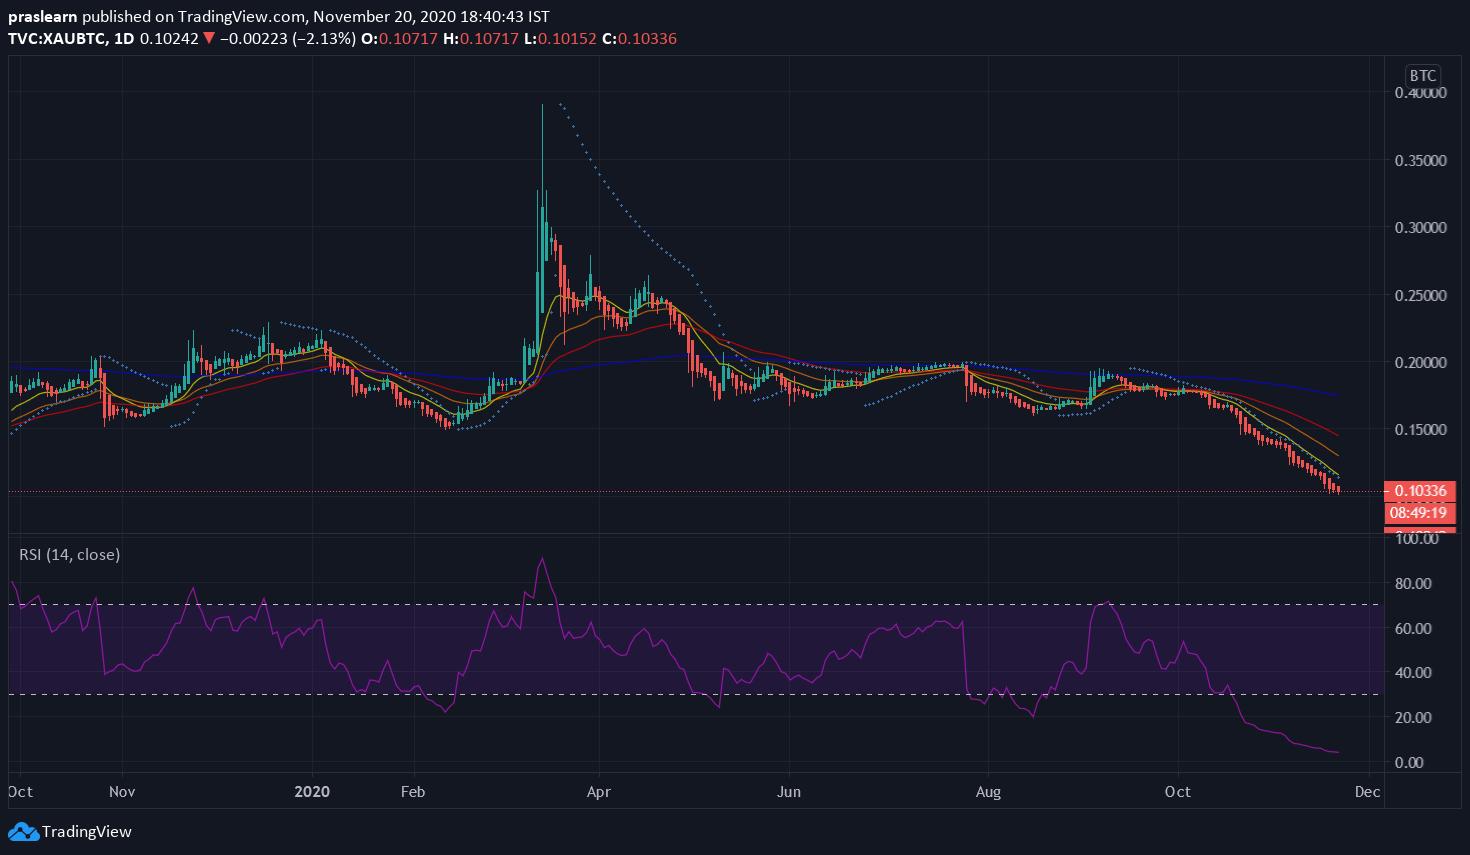 XAU/BTC Daily chart – TradingView